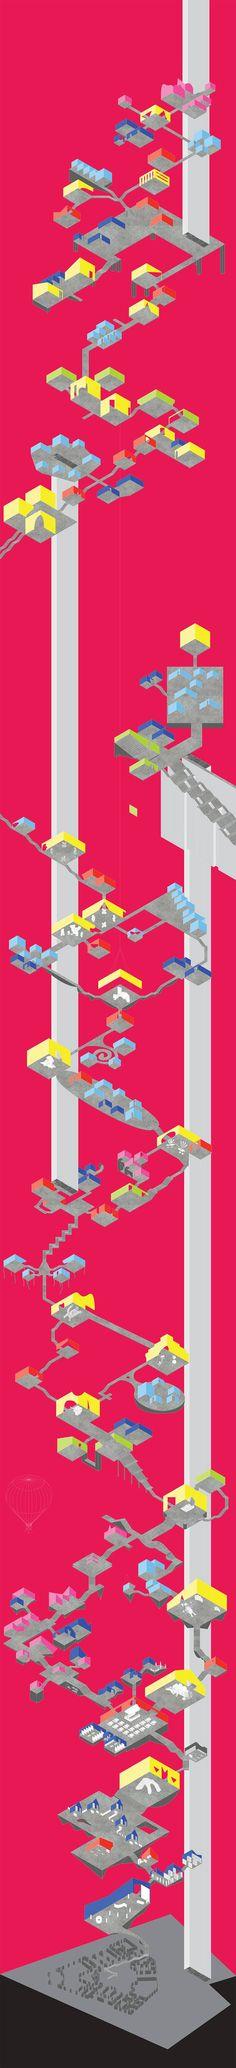 BUREAU SPECTACULAR   a f a s i a presentatie isometrie roze rood grafisch poster circulatie